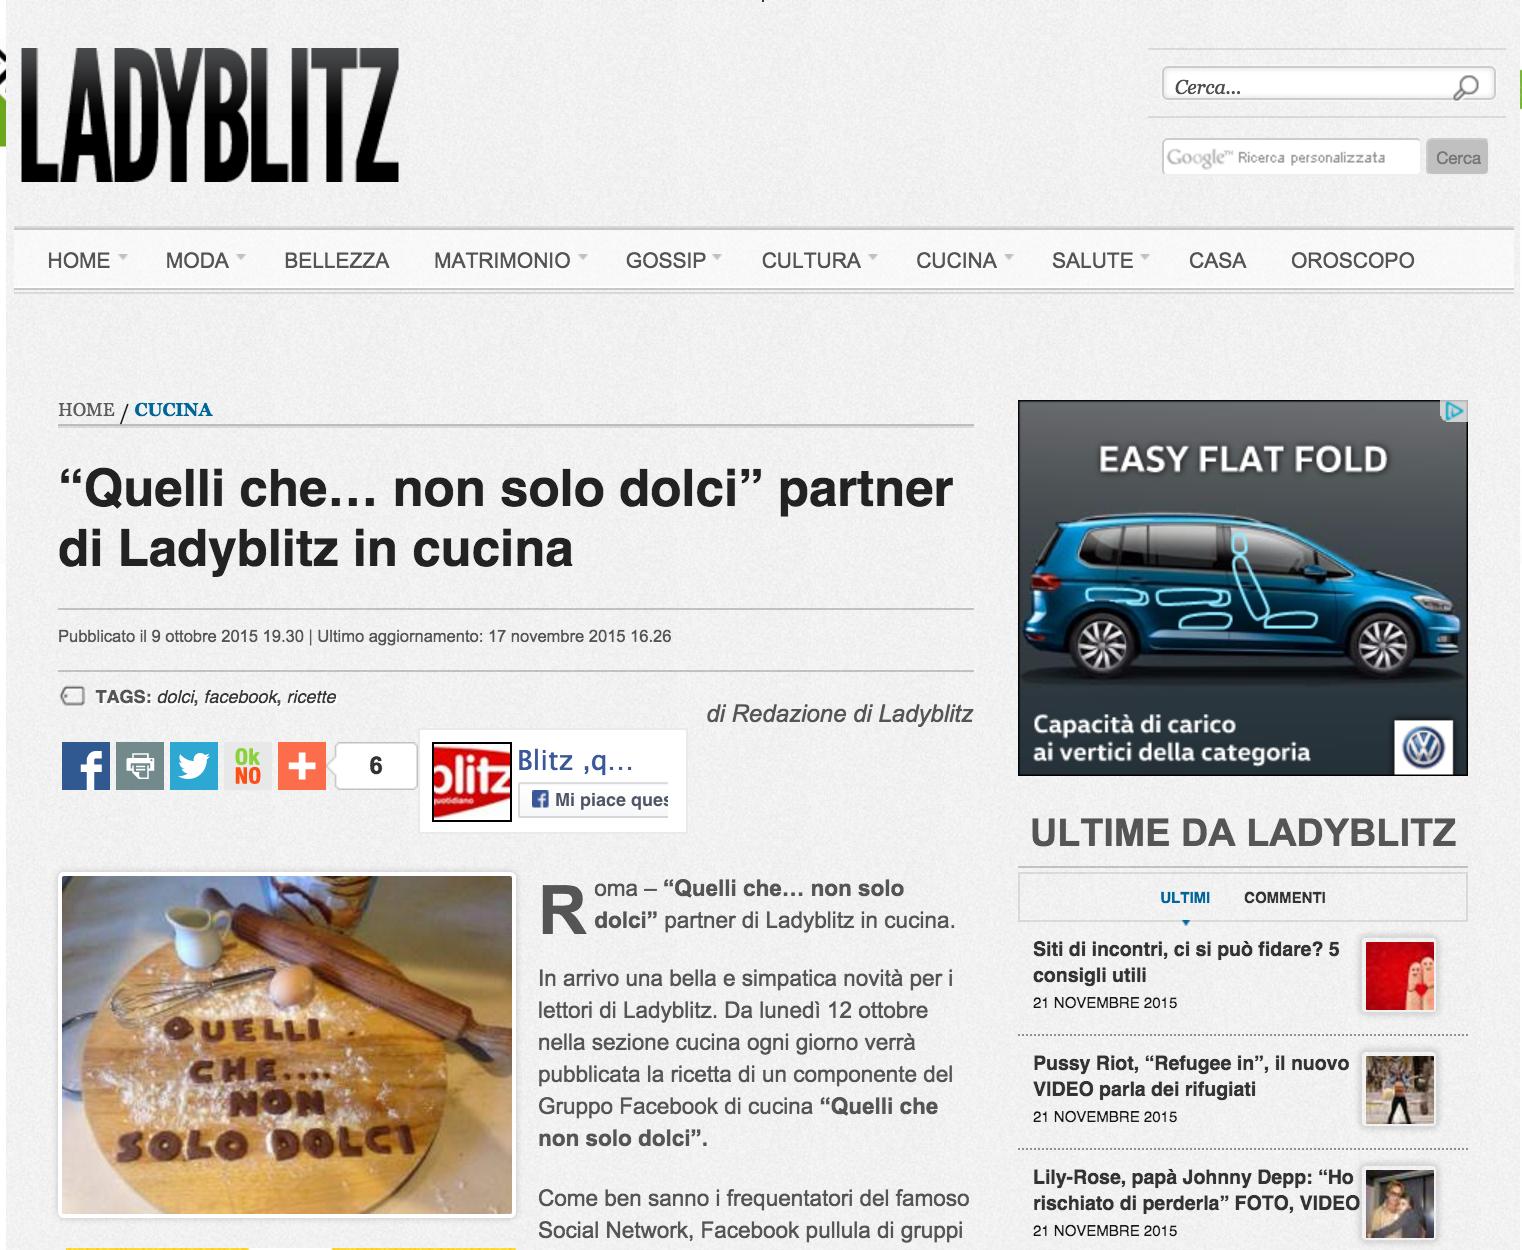 Partner di Ladyblitz